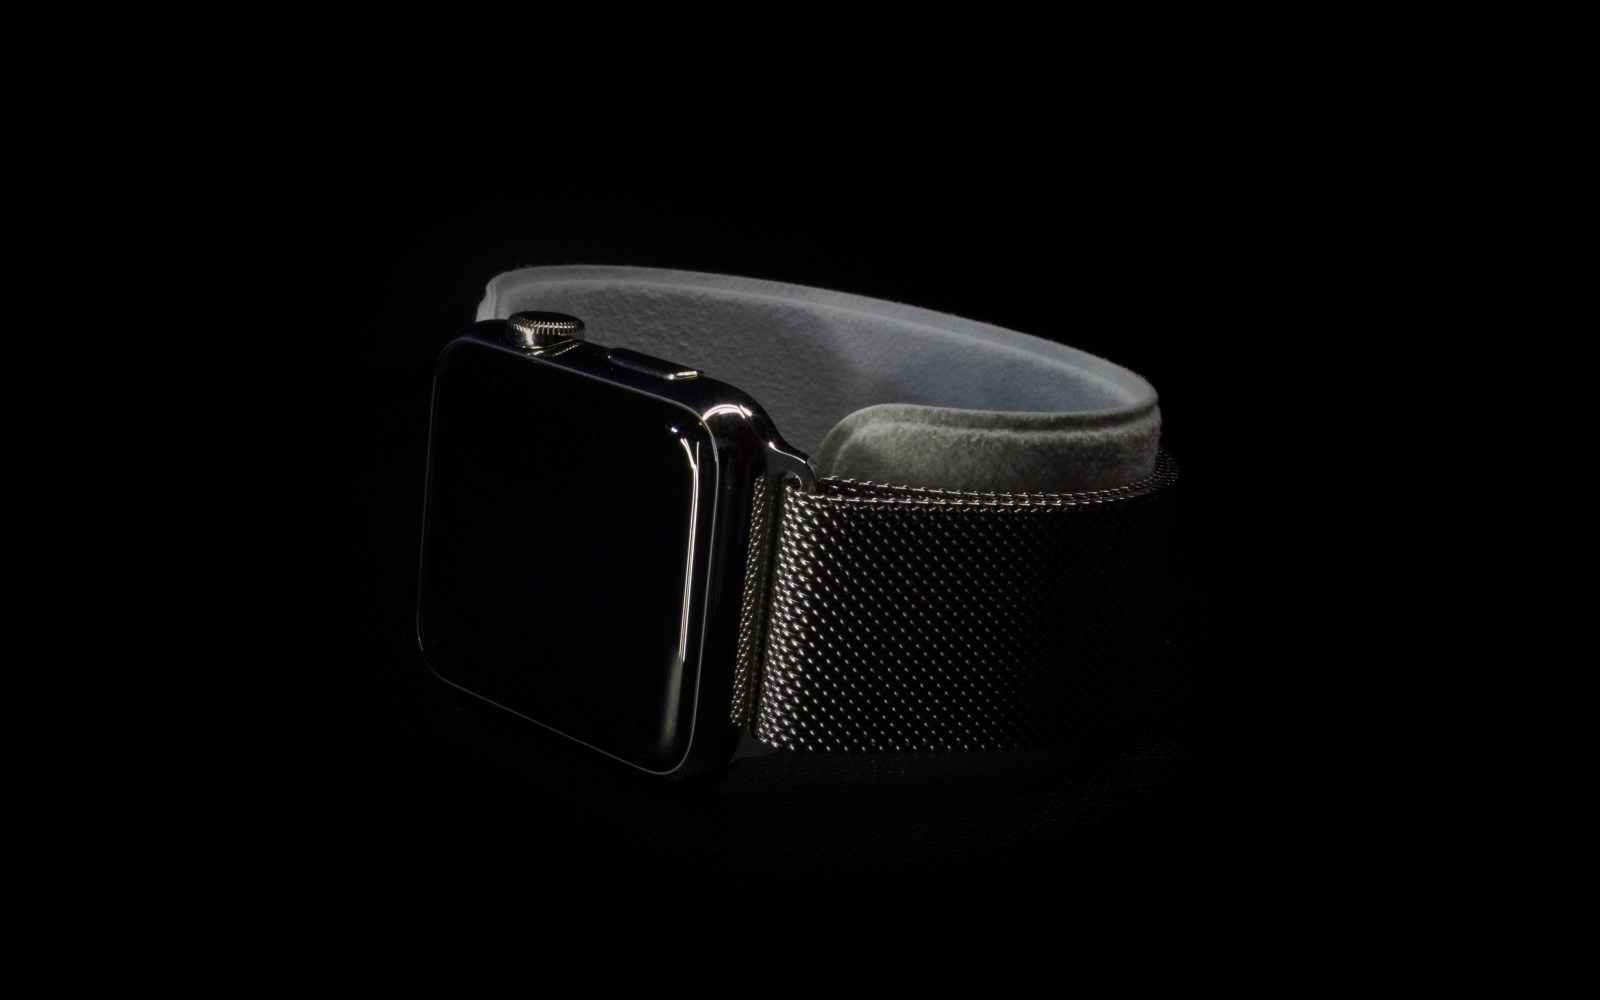 Review: Apple Watch as a design piece